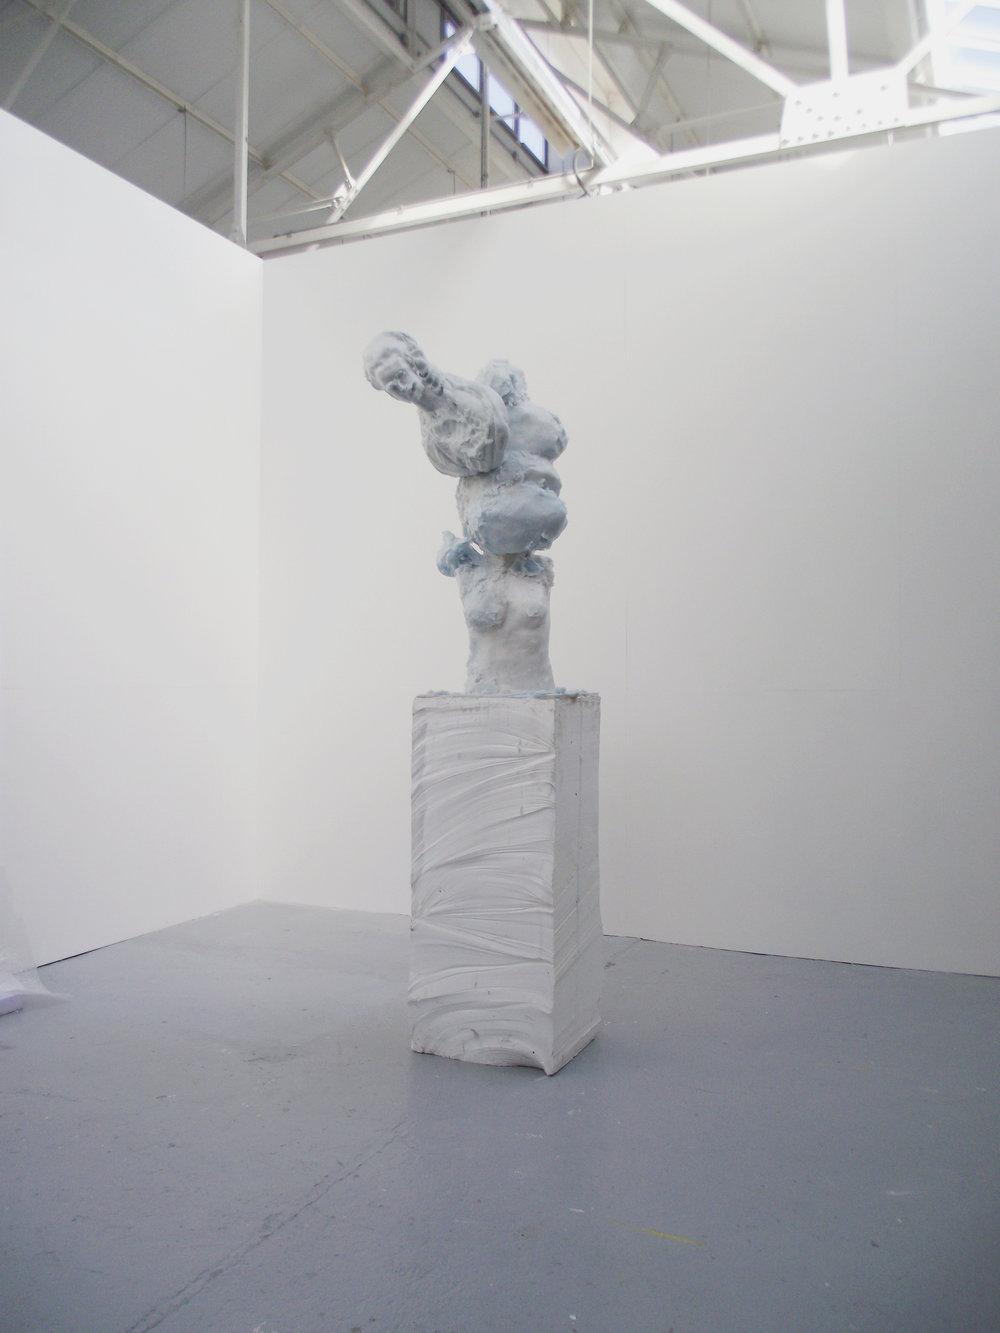 Jamie Fitzpatrick, Statue, 2015. Wax, Polyurethane Foam, Polystyrene, and Steel; 245 cm x 69 x 51 cm. Image courtesy of the artist.